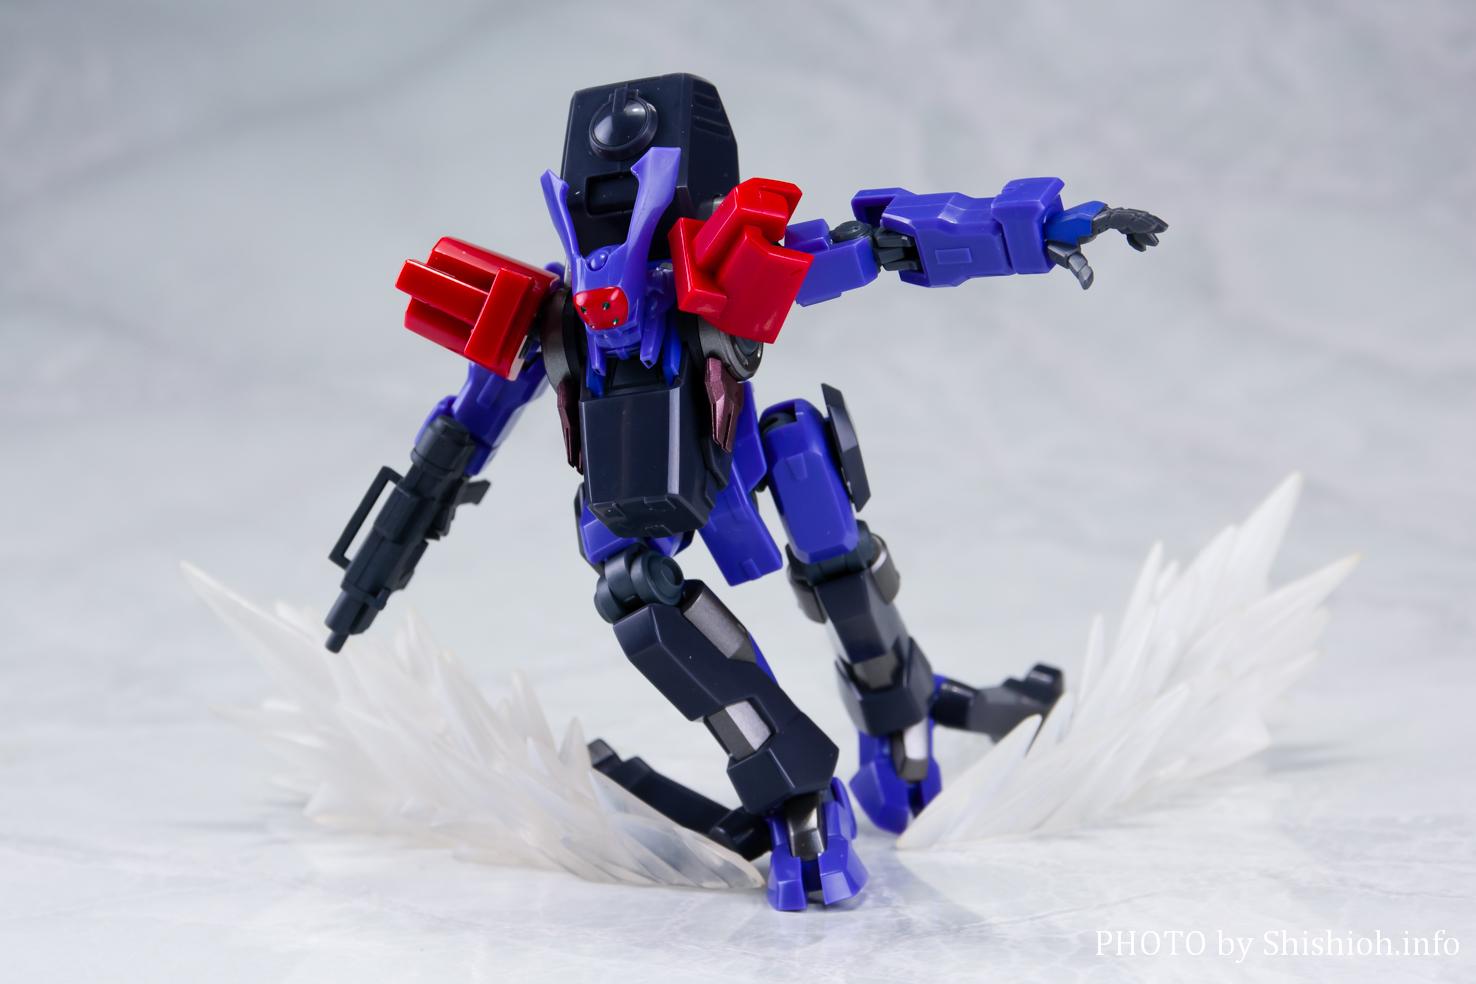 ROBOT魂〈SIDE KMF〉 サザーランド純血派機&一般機パーツセット